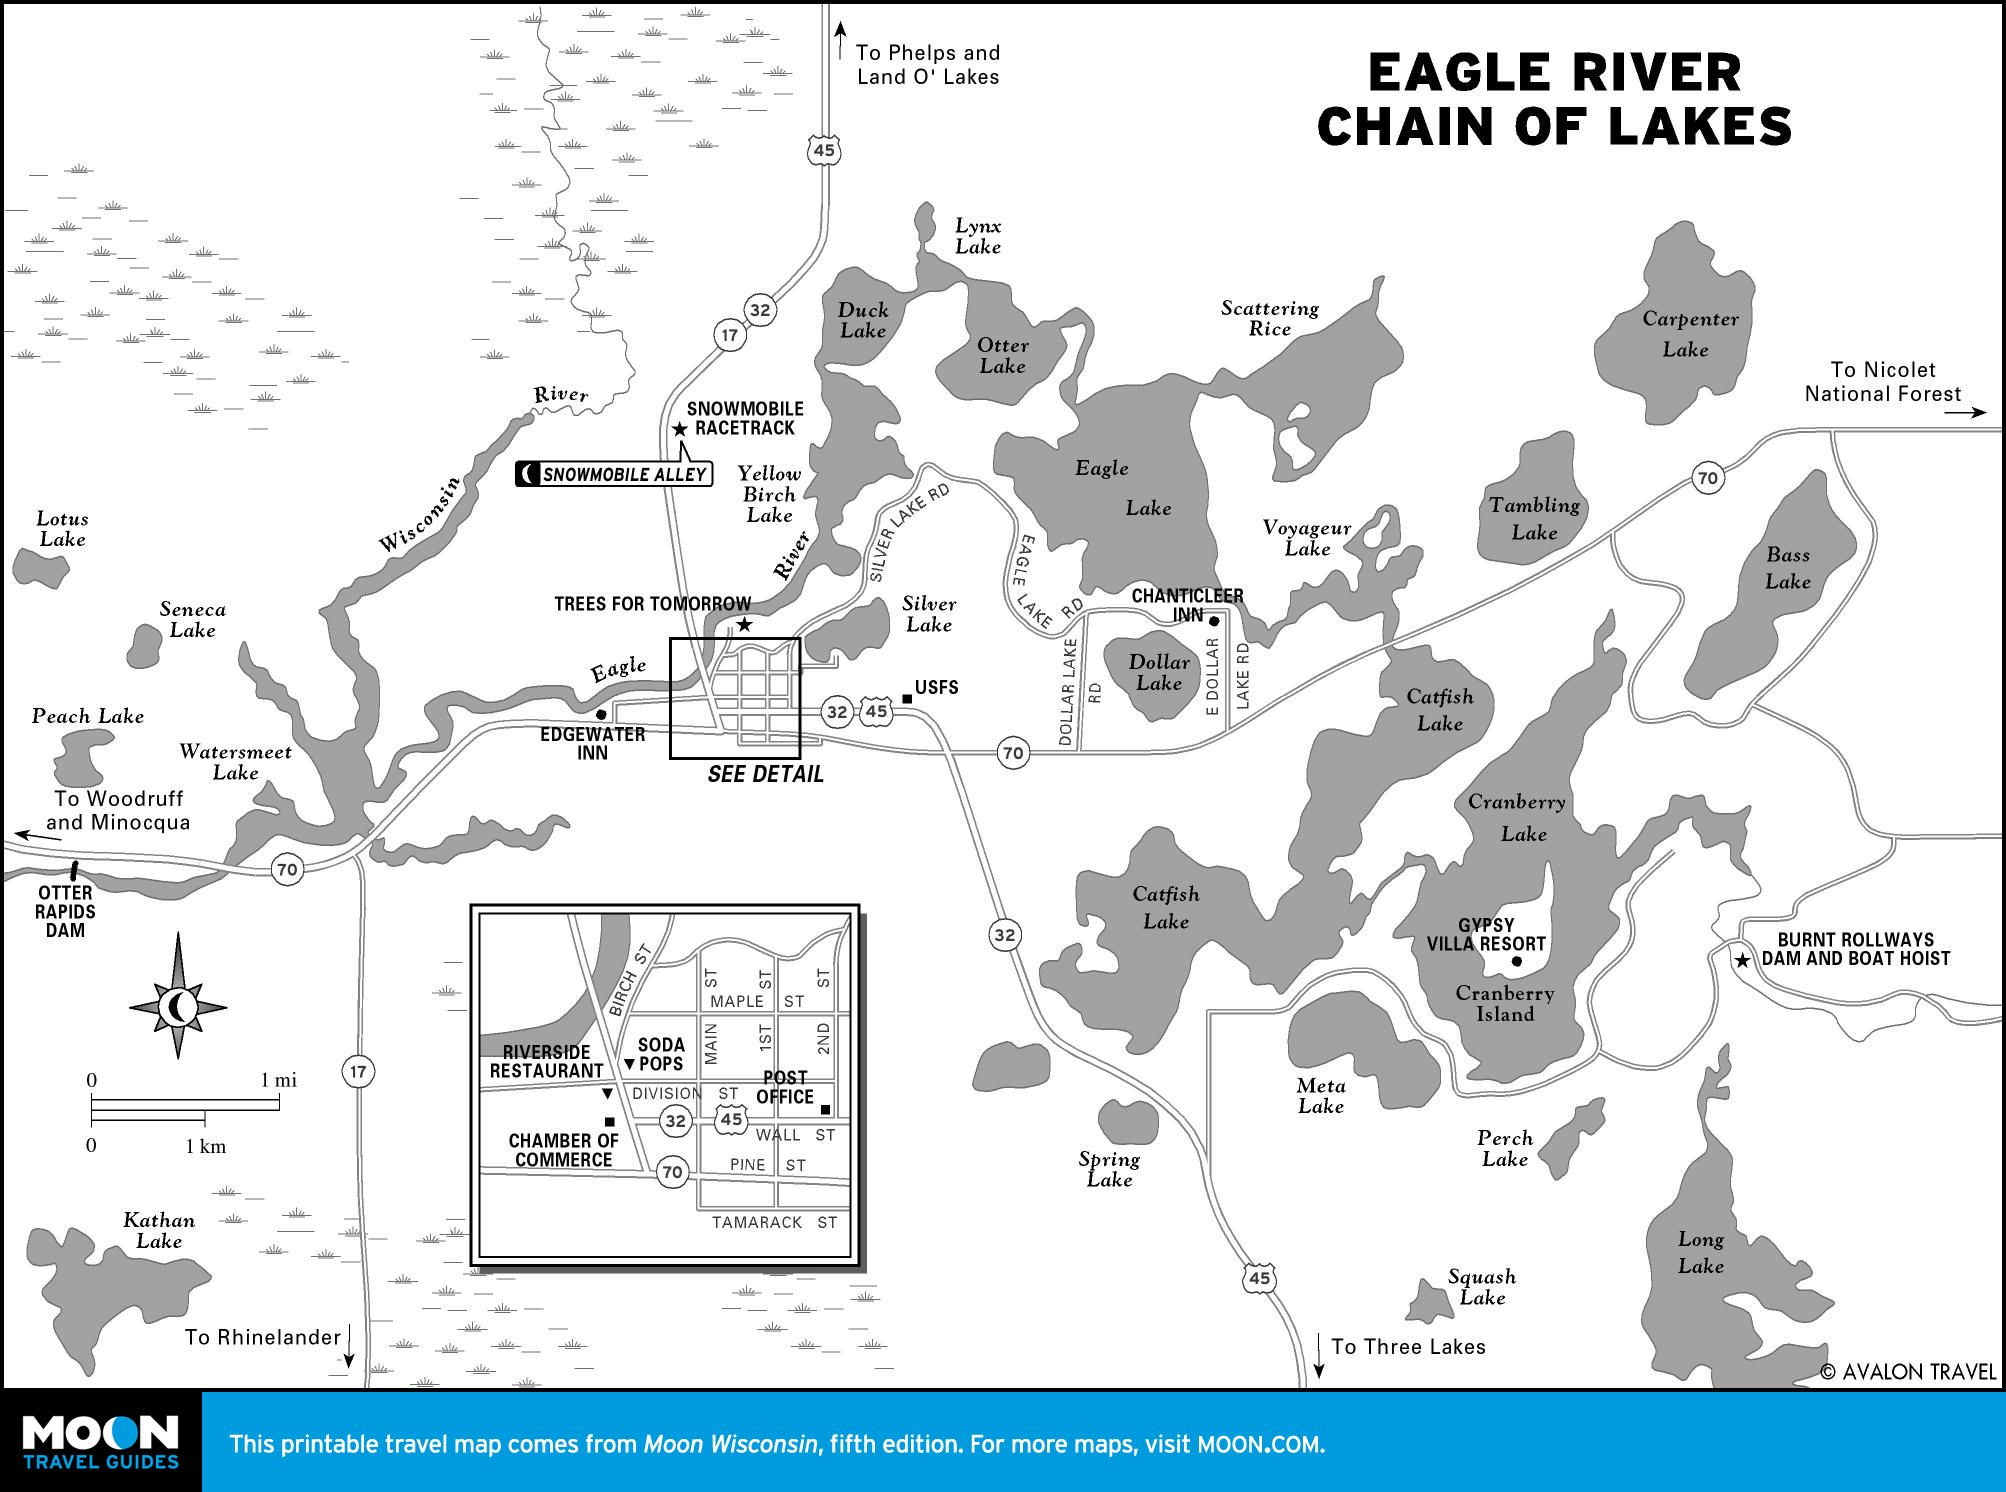 Eagle Rive Chain Of Lakes Eagle River River Lake